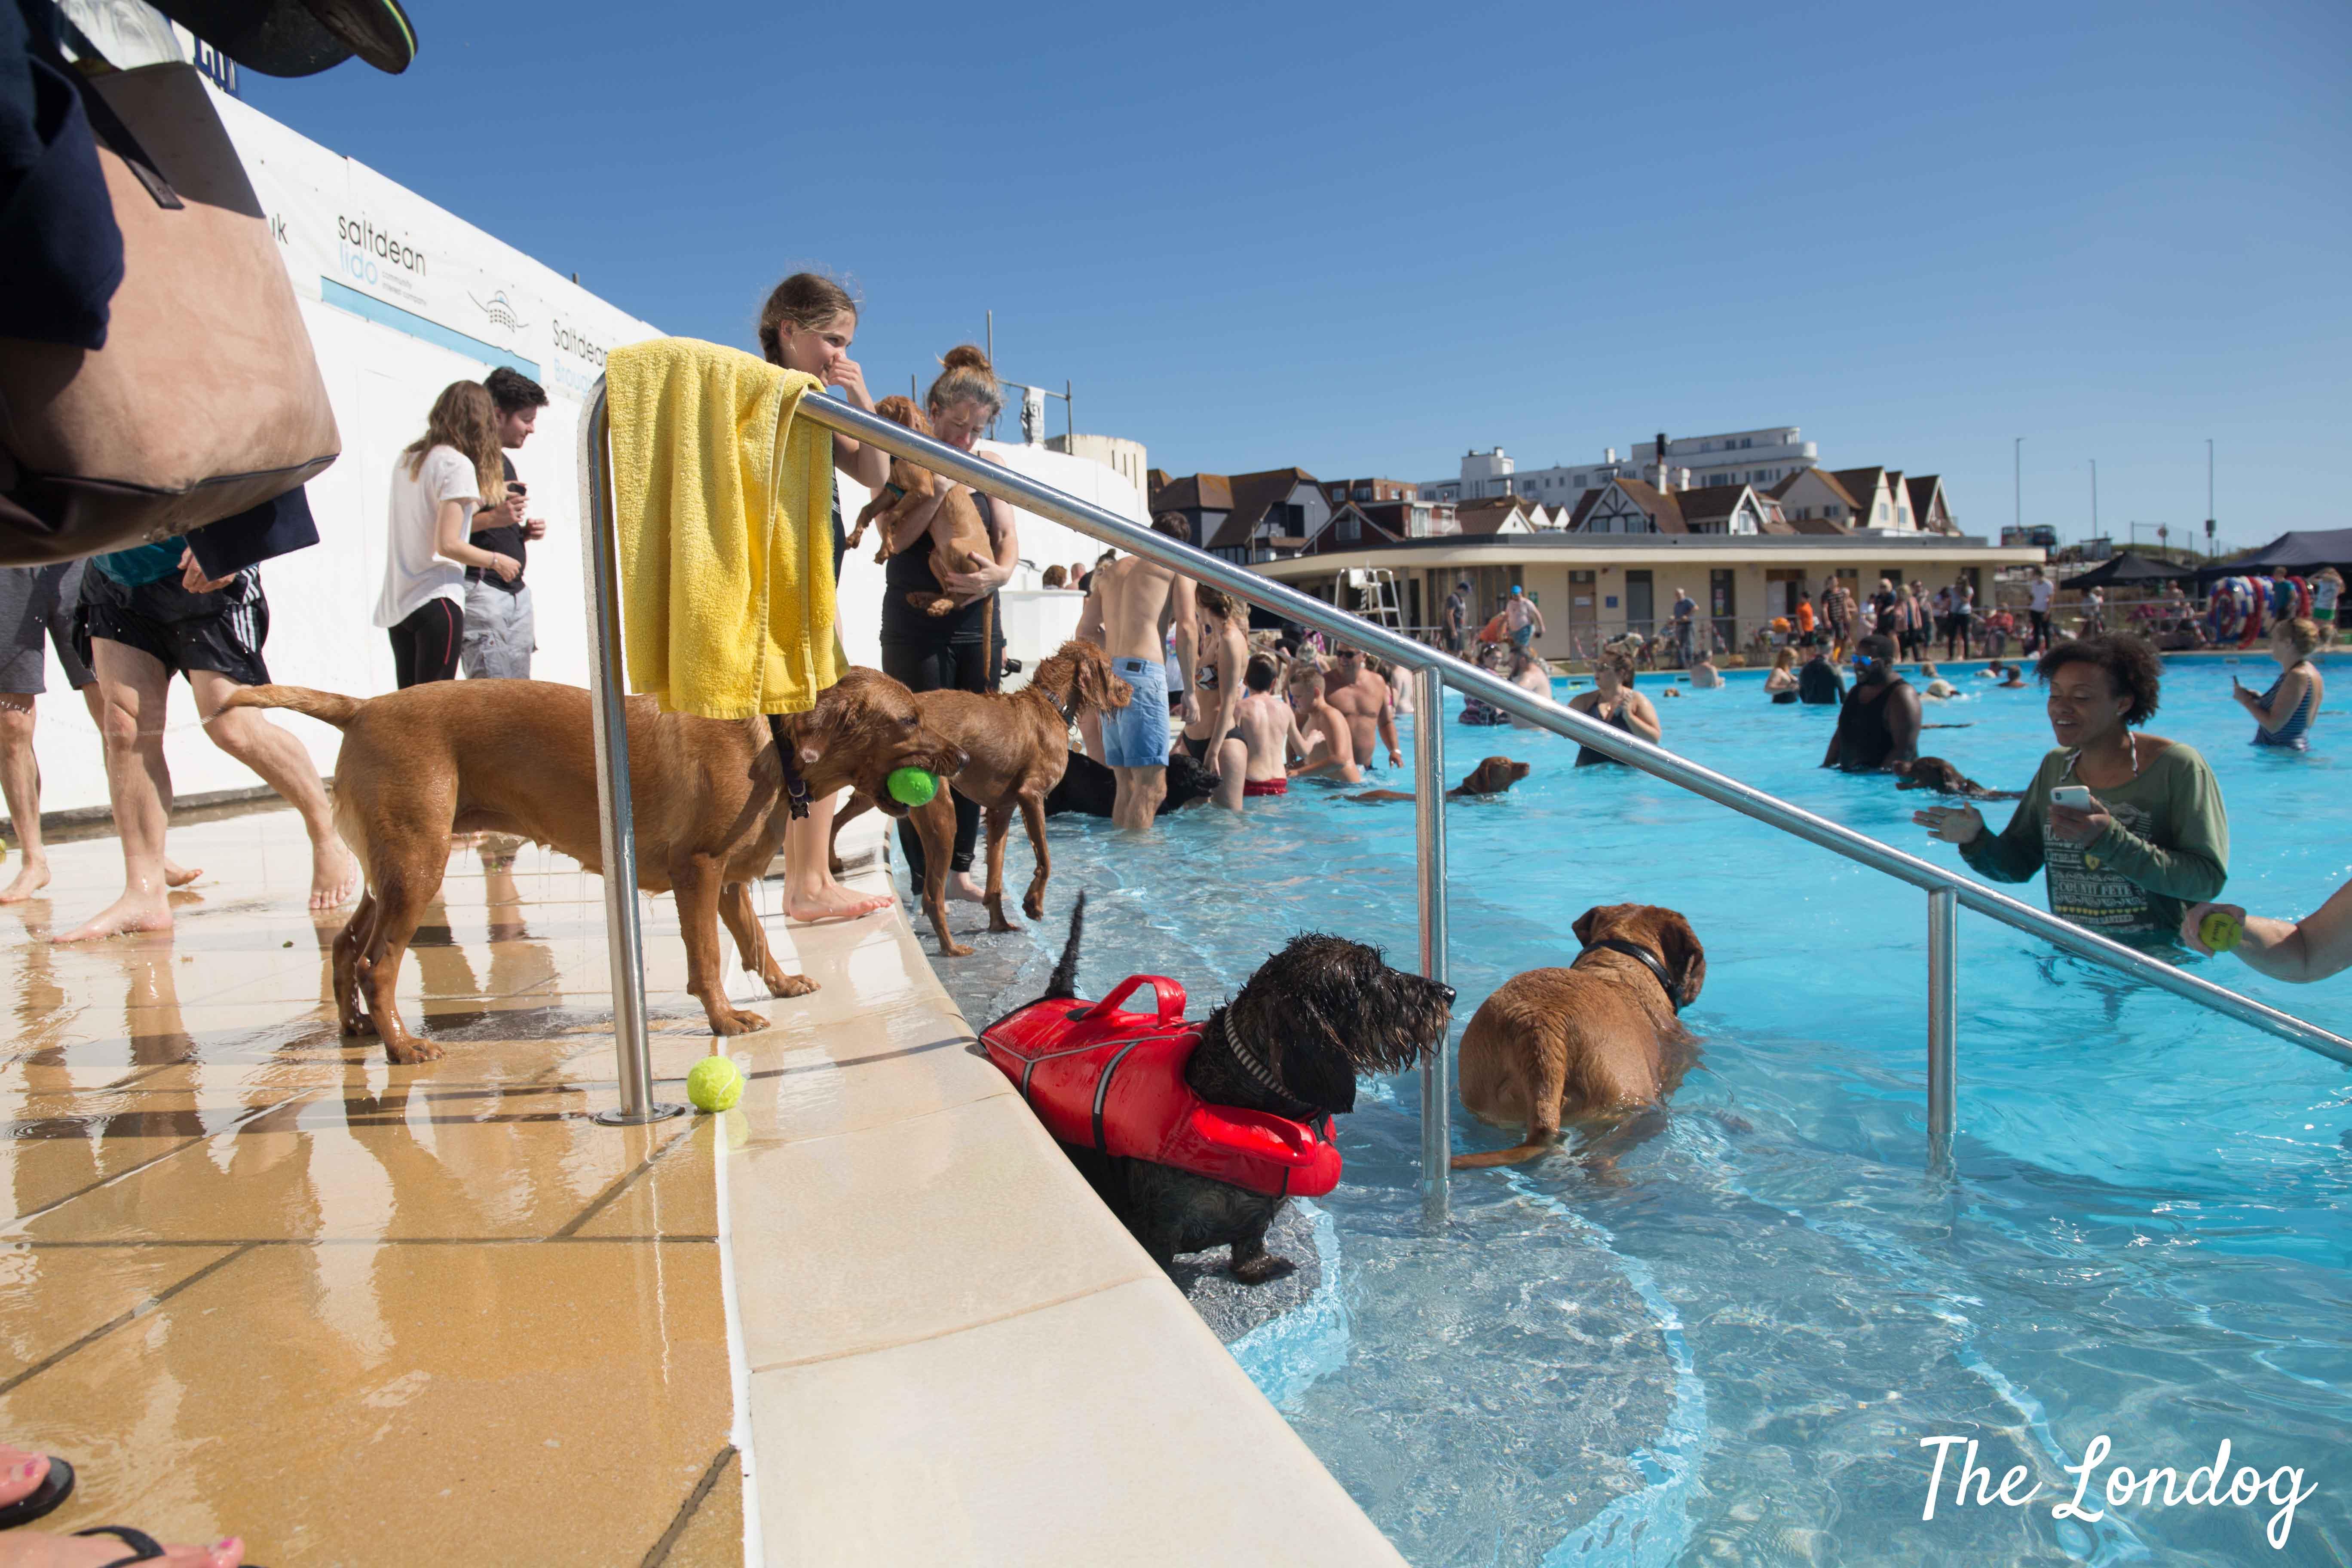 Dogs in swimming pool at Saltdean Lido Dog Swim